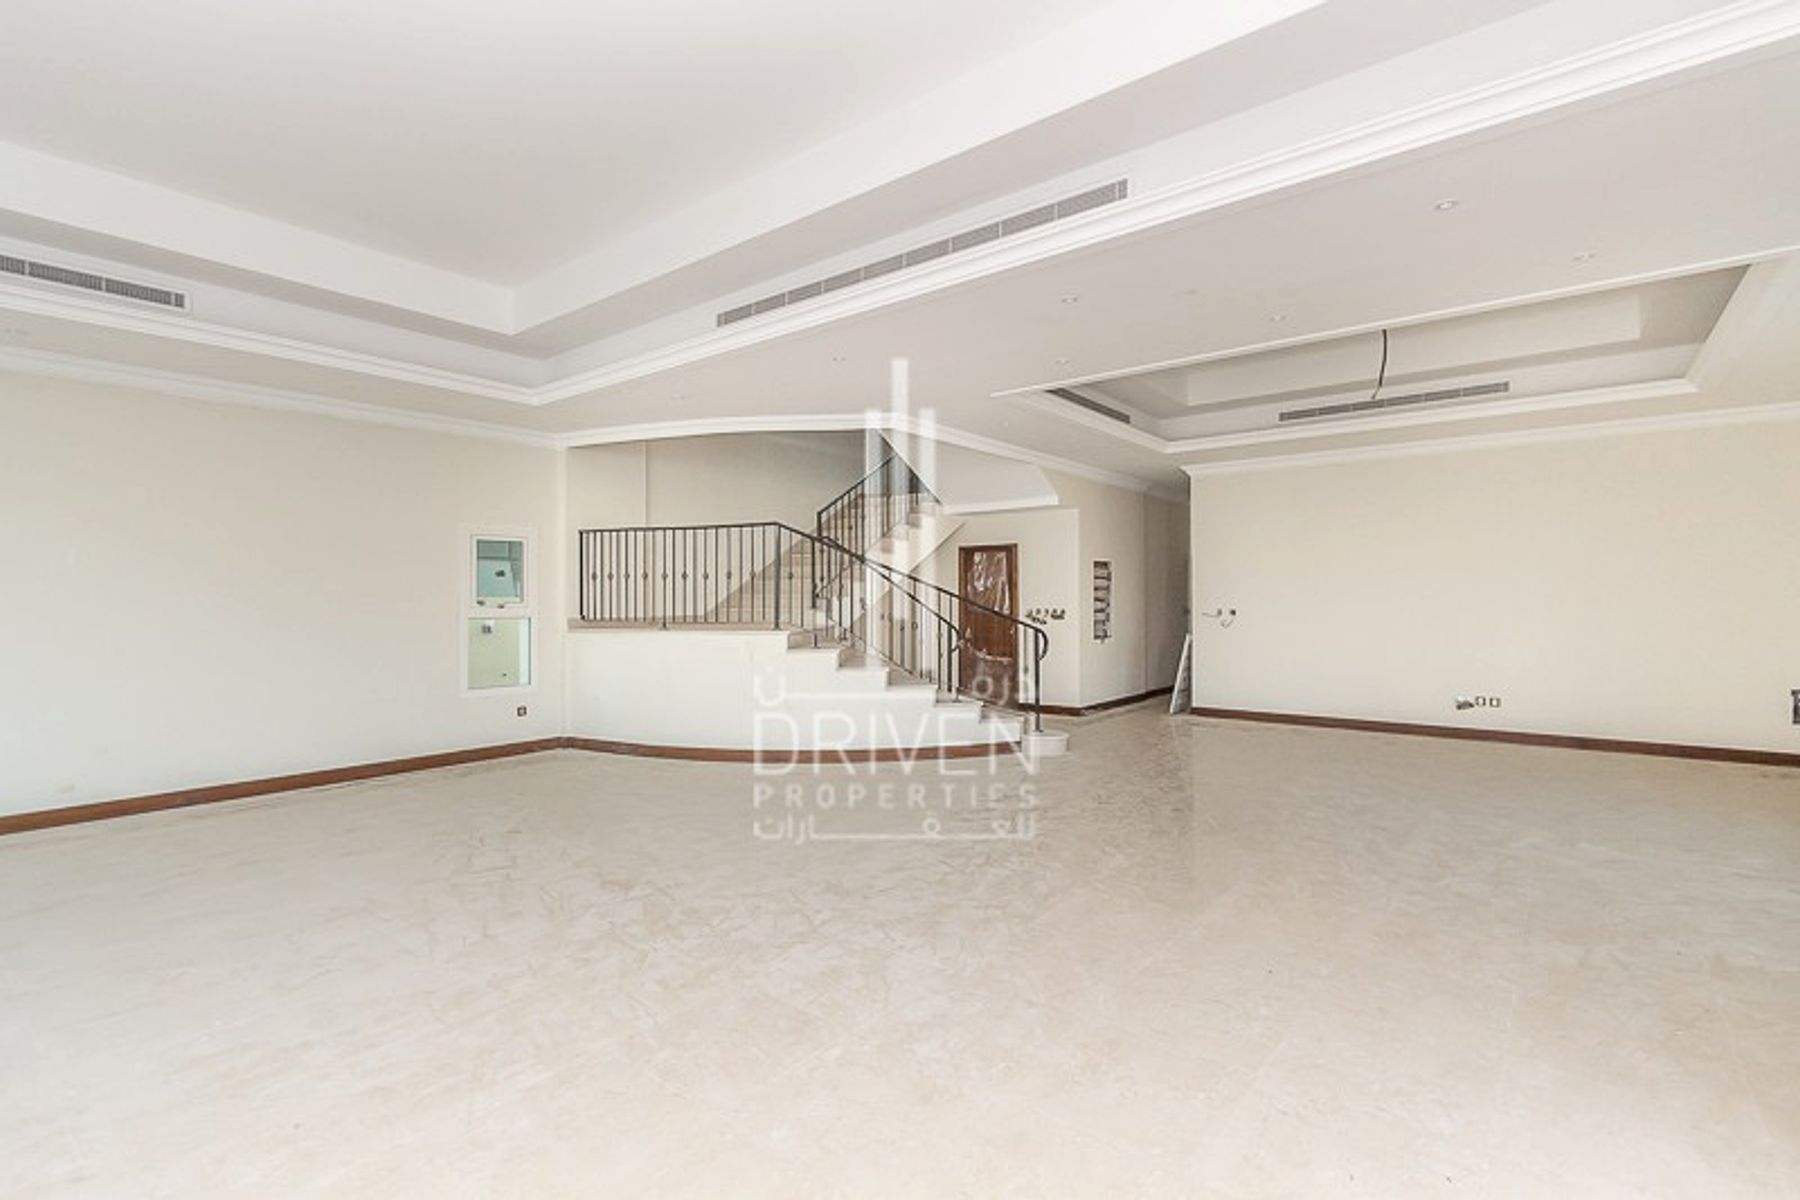 Commercial Villa for Rent in Jumeirah 1 Villas - Jumeirah